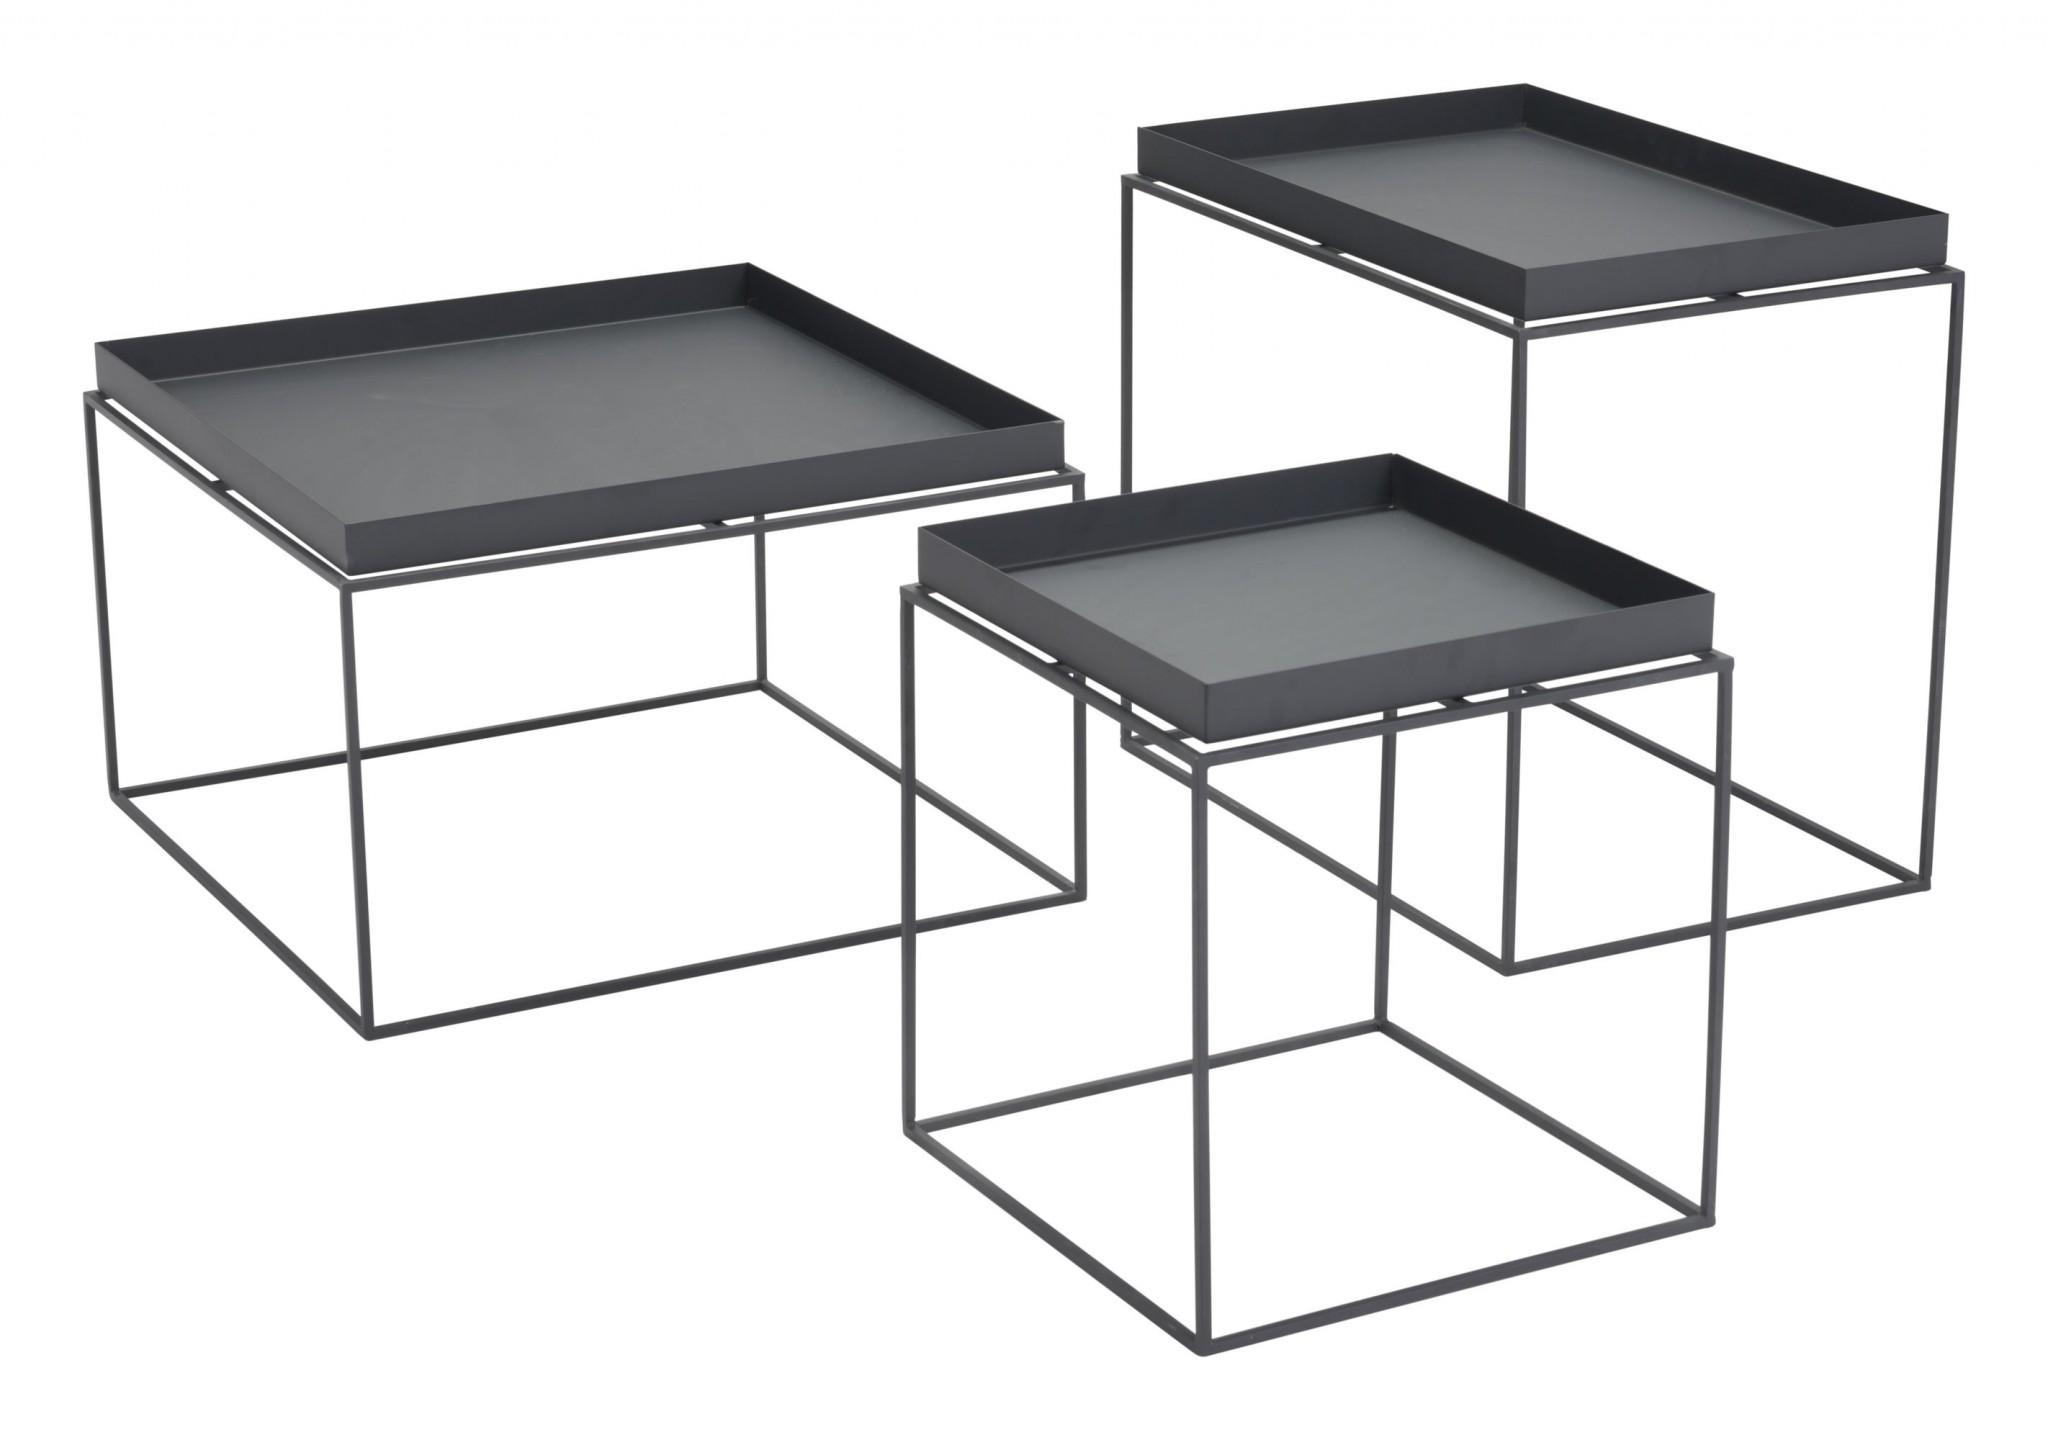 "23.6"" x 23.6"" x 15.7"" Black, Steel, Nesting Table"